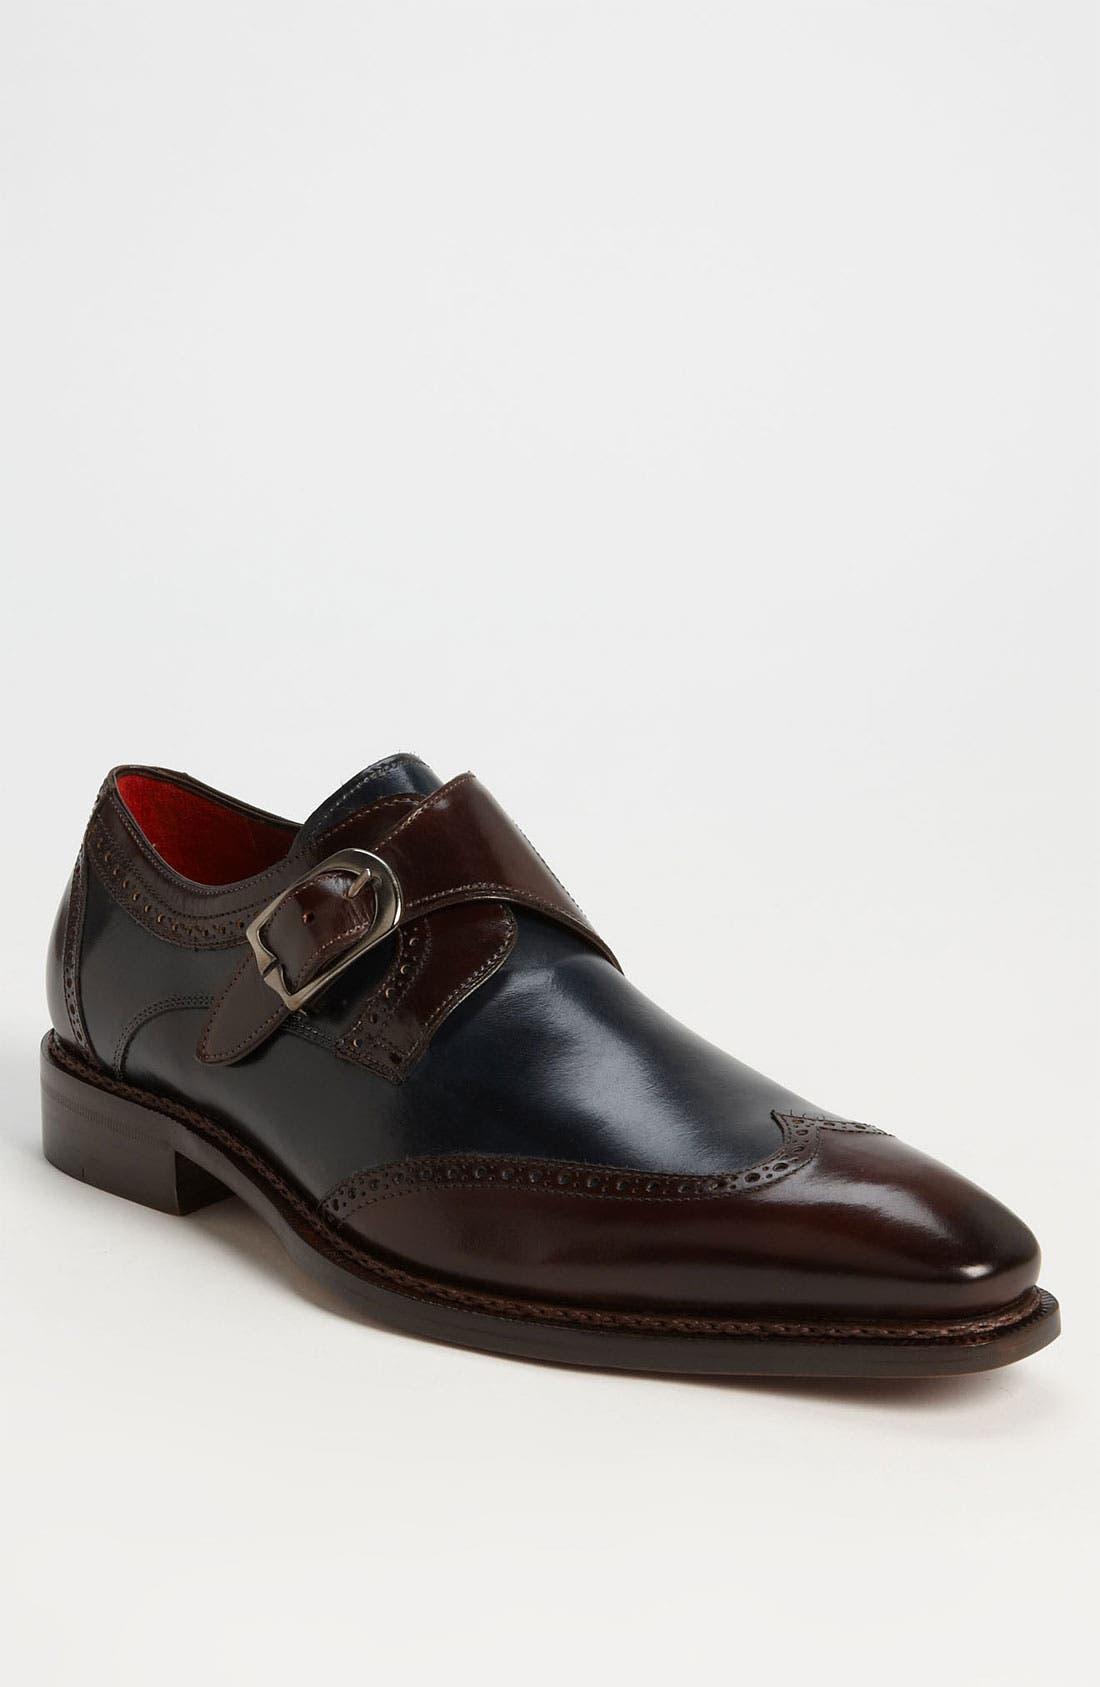 Alternate Image 1 Selected - Mezlan 'Cleto' Monk Strap Spectator Shoe